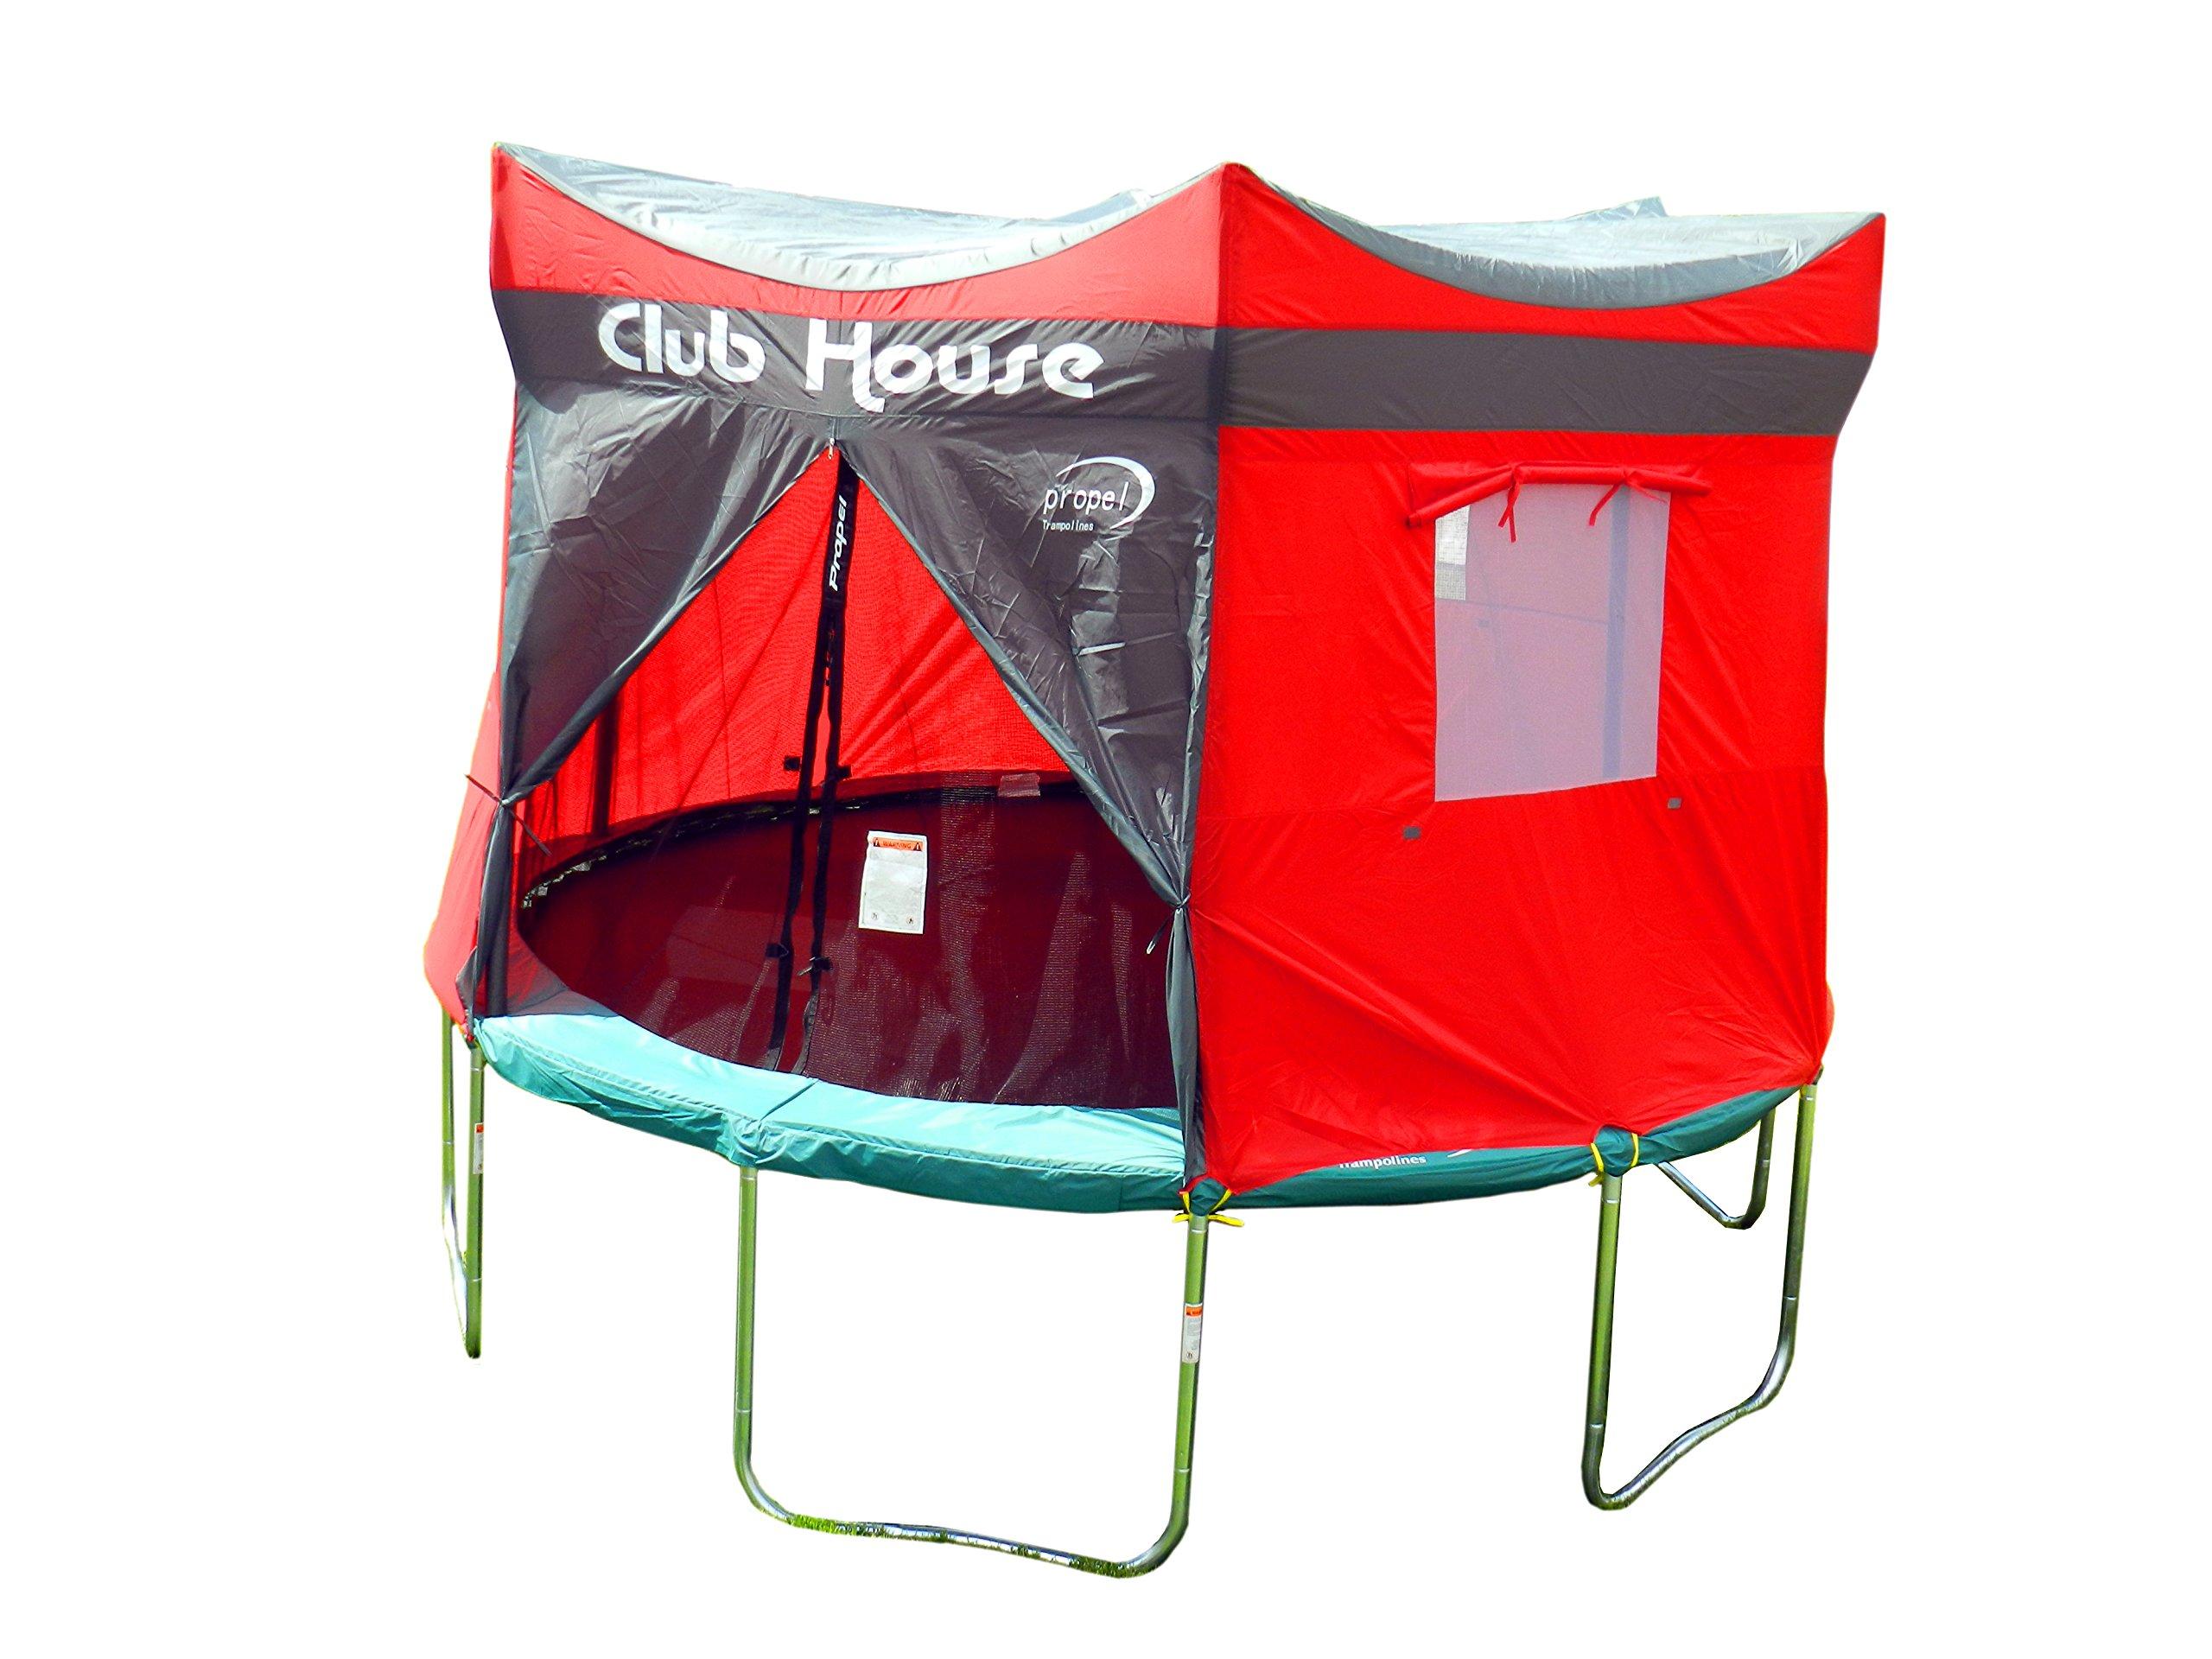 Propel Trampolines P12-6TT Trampoline Club House Cover, 12-Feet